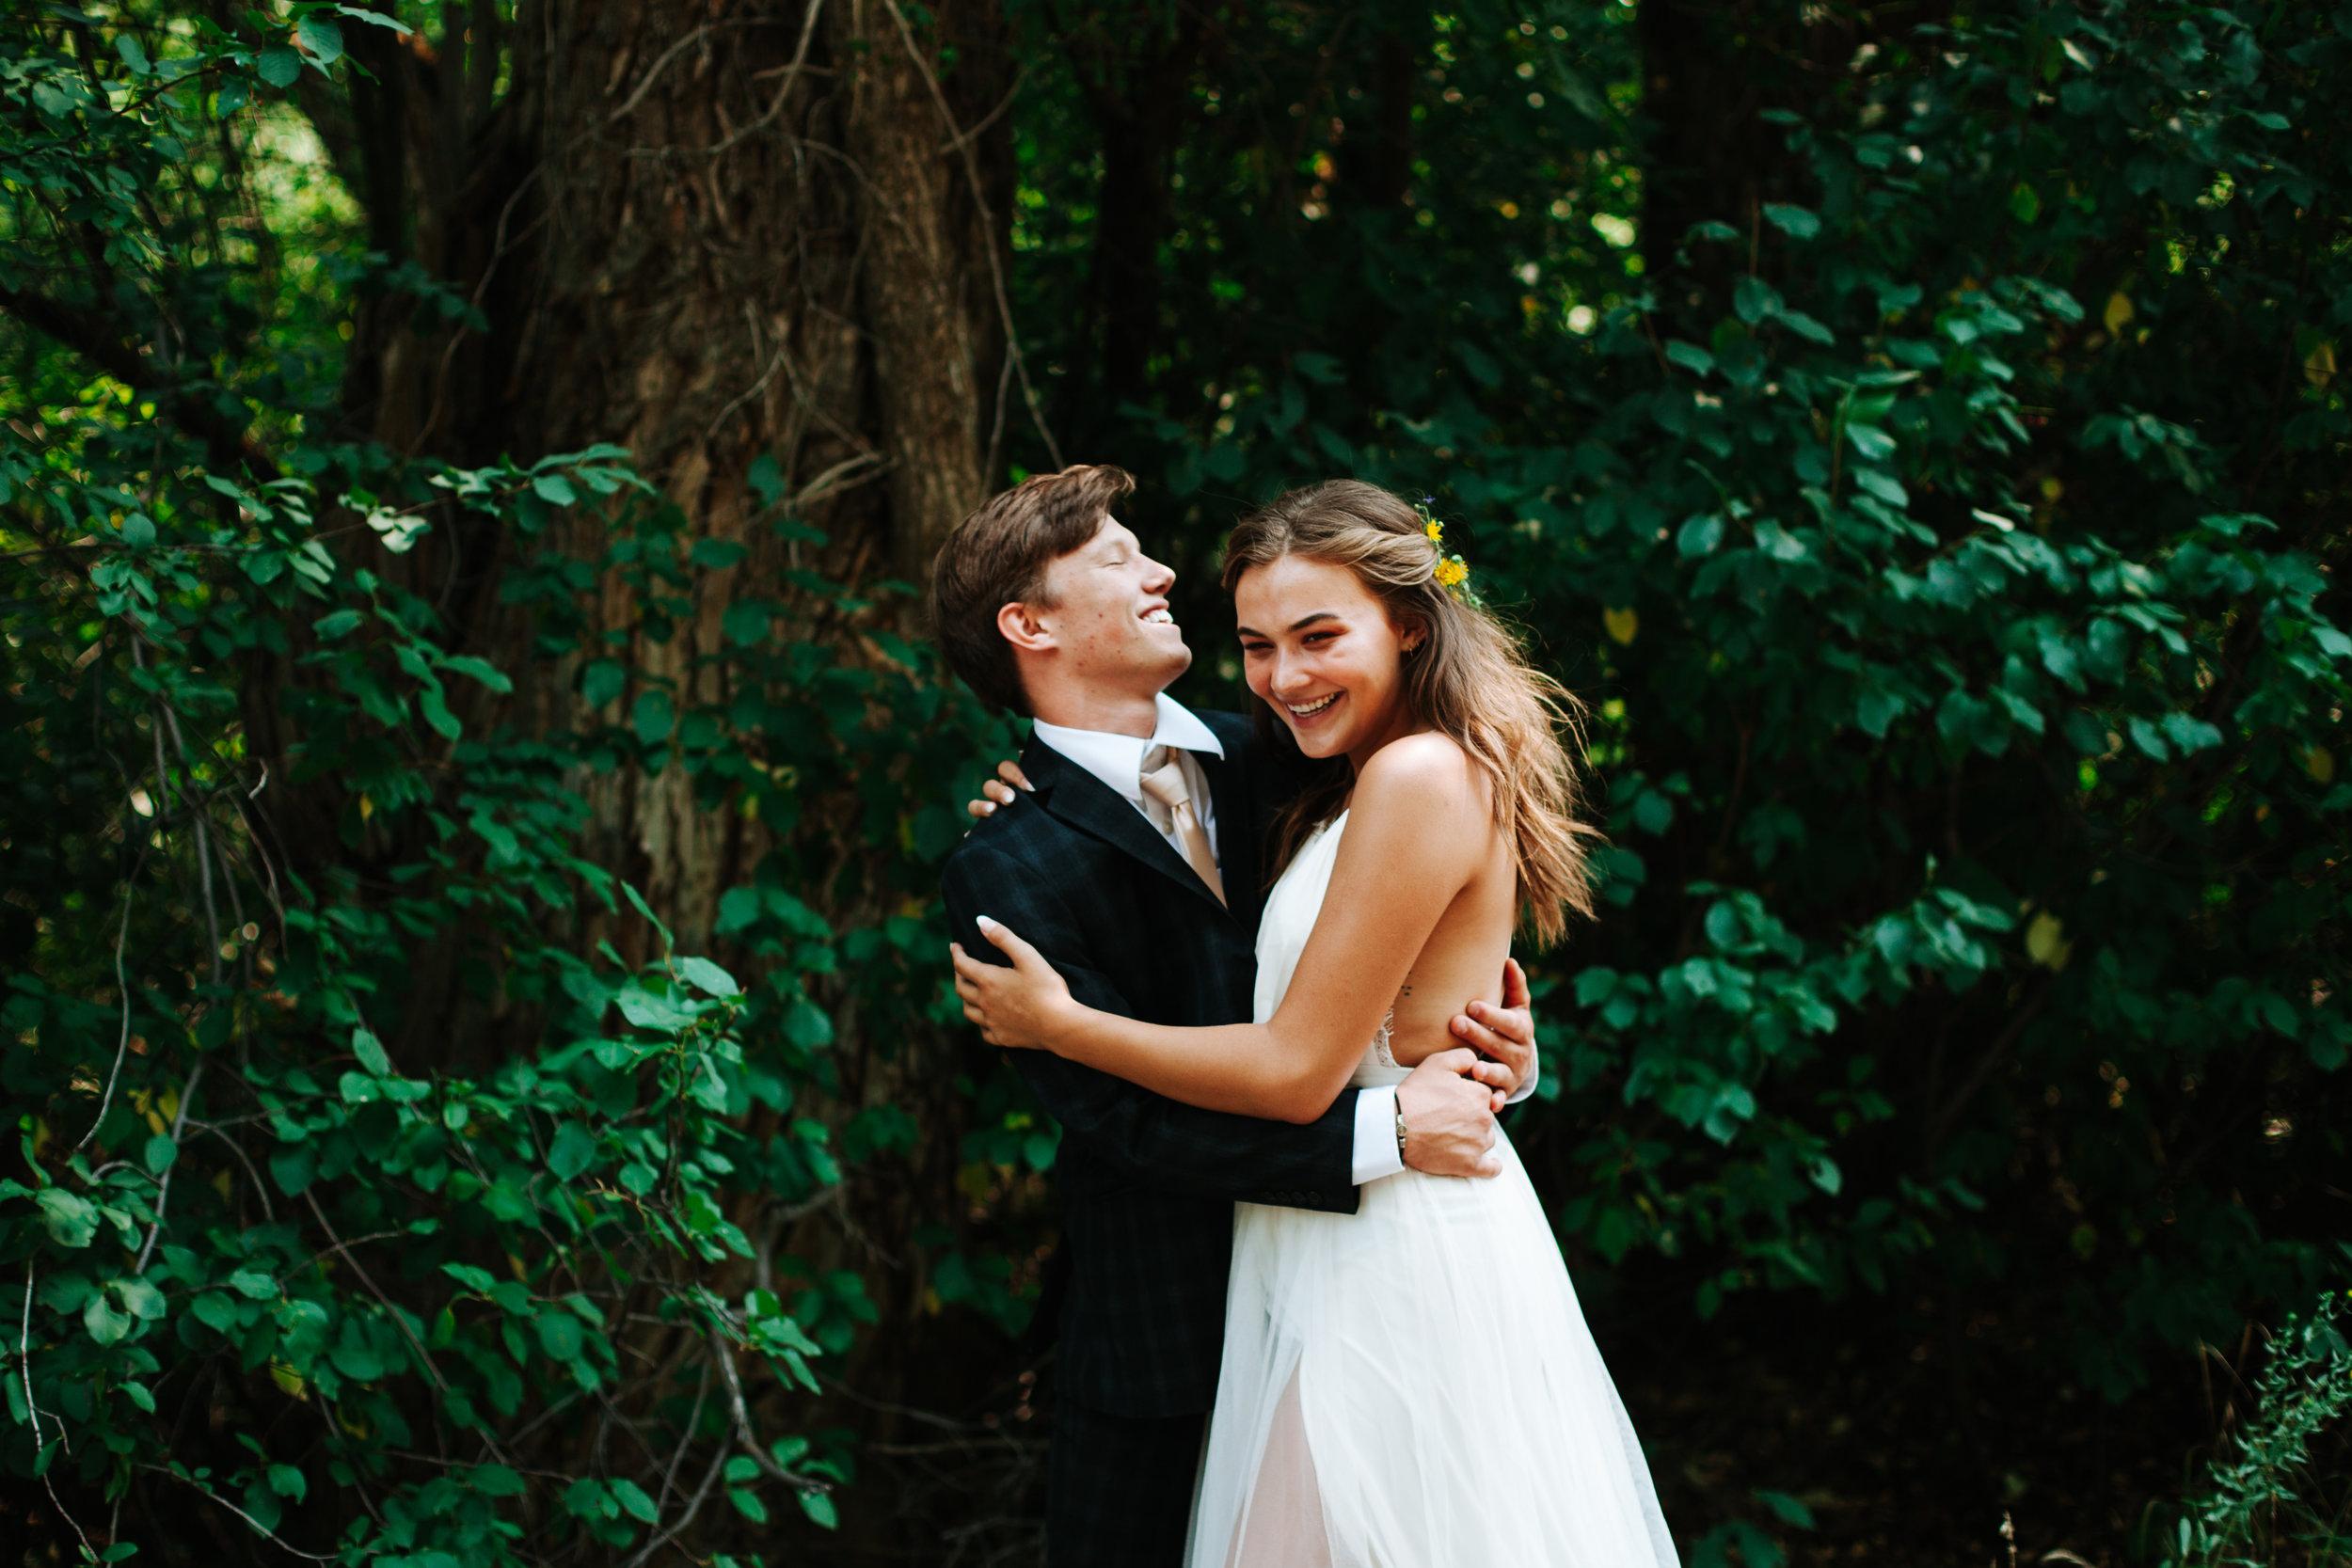 Utah Canyon Wedding, Formal Wedding Photos, Candid Wedding Moments, Utah Wedding Photographer, Salt Lake City Wedding, Salt Lake City Wedding Photographer | Marina Rey Photography